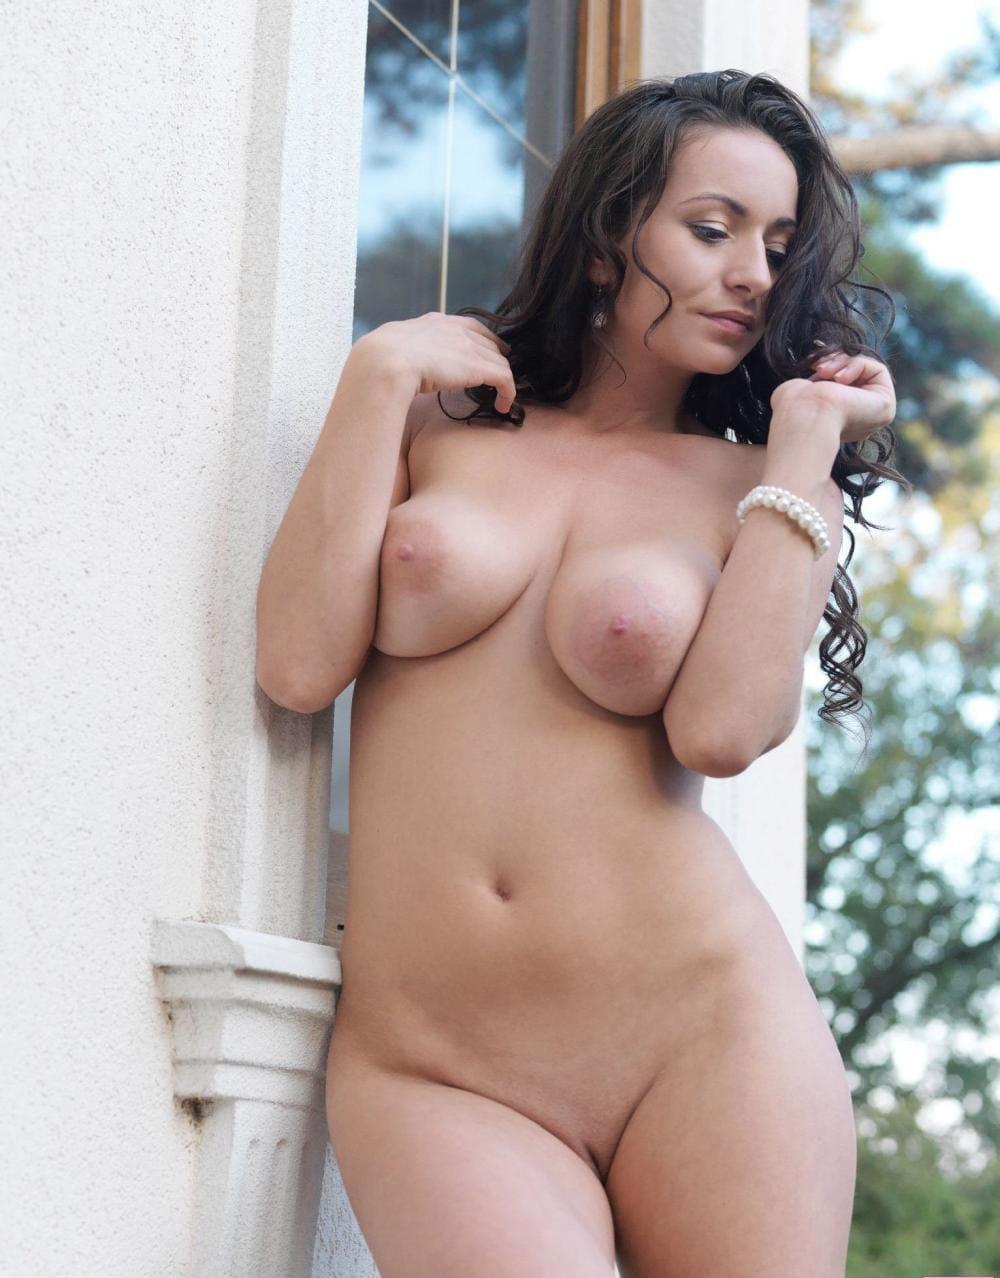 Голые груди брюнеток стоит возле окна на улице на руке браслет